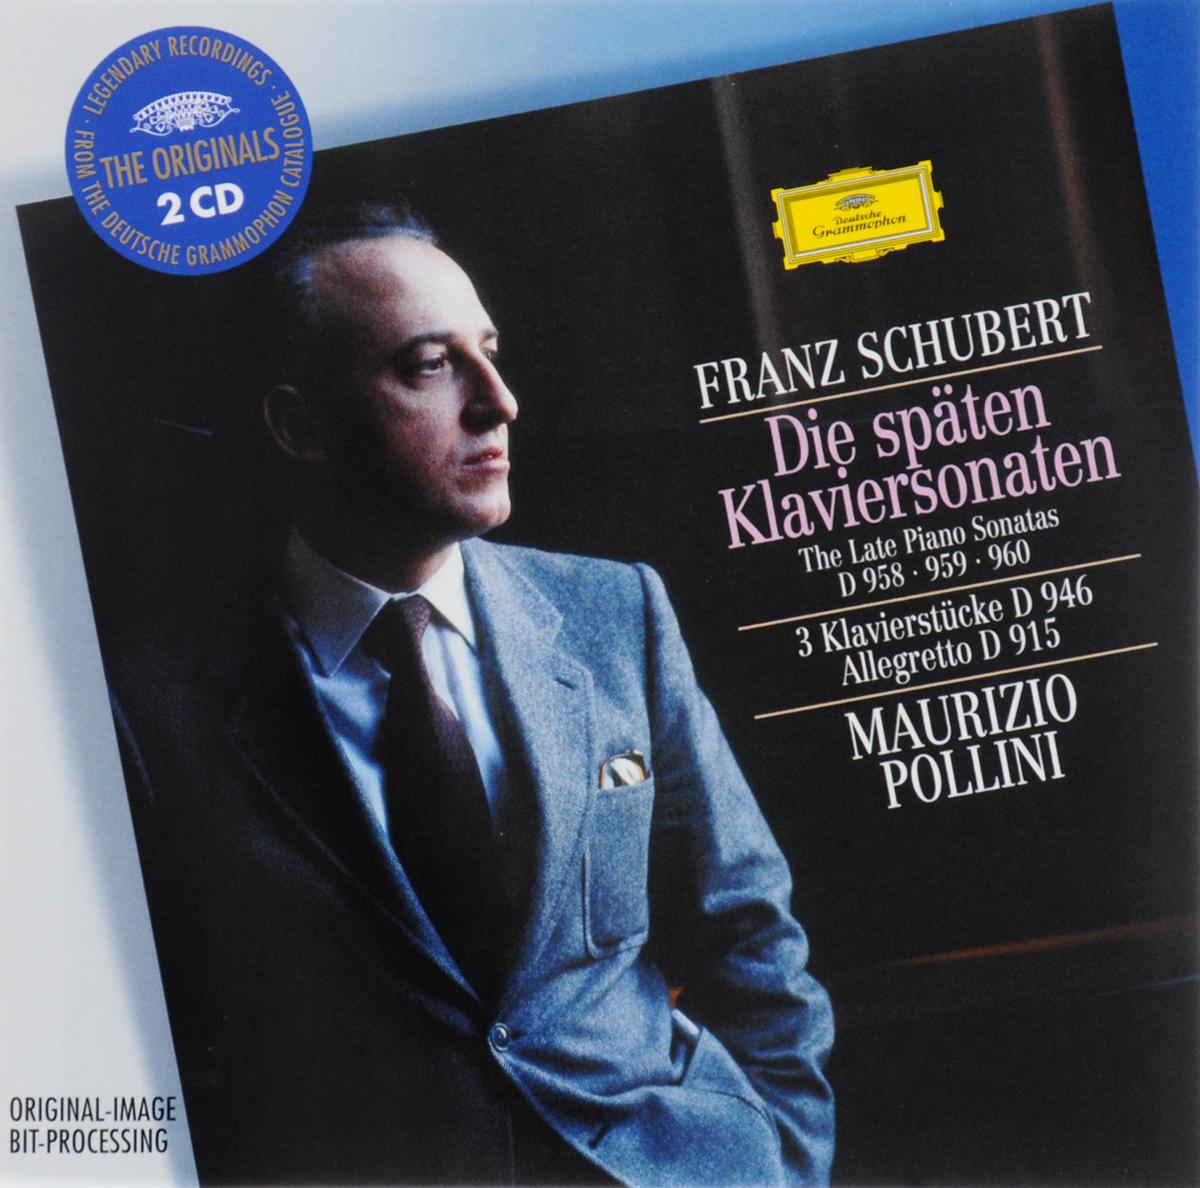 Маурицио Поллини Maurizio Pollini. Schubert. The Late Piano Sonatas D 958-960 (2 CD)